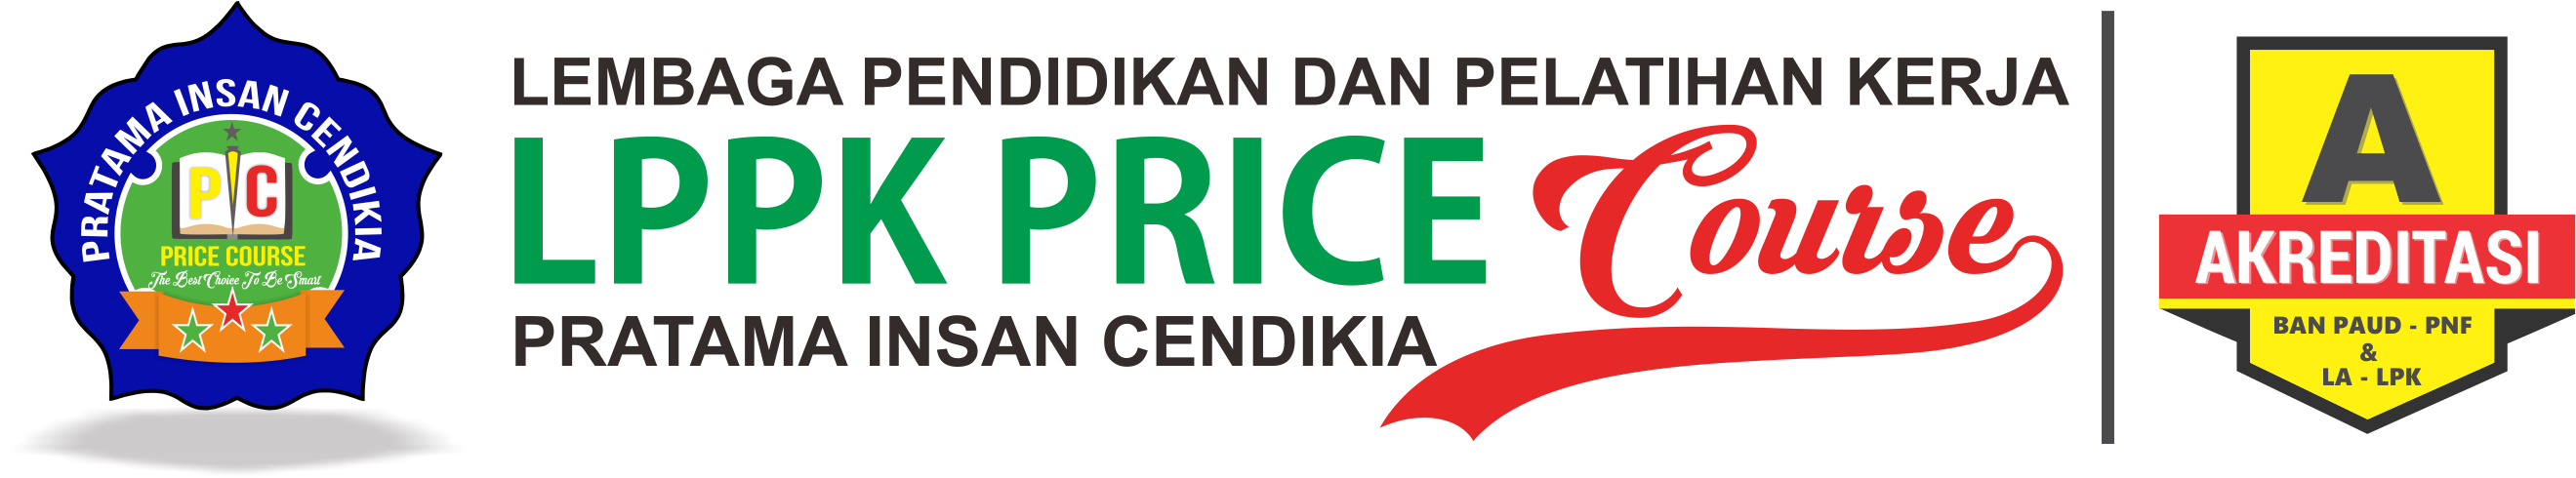 PRICE Course